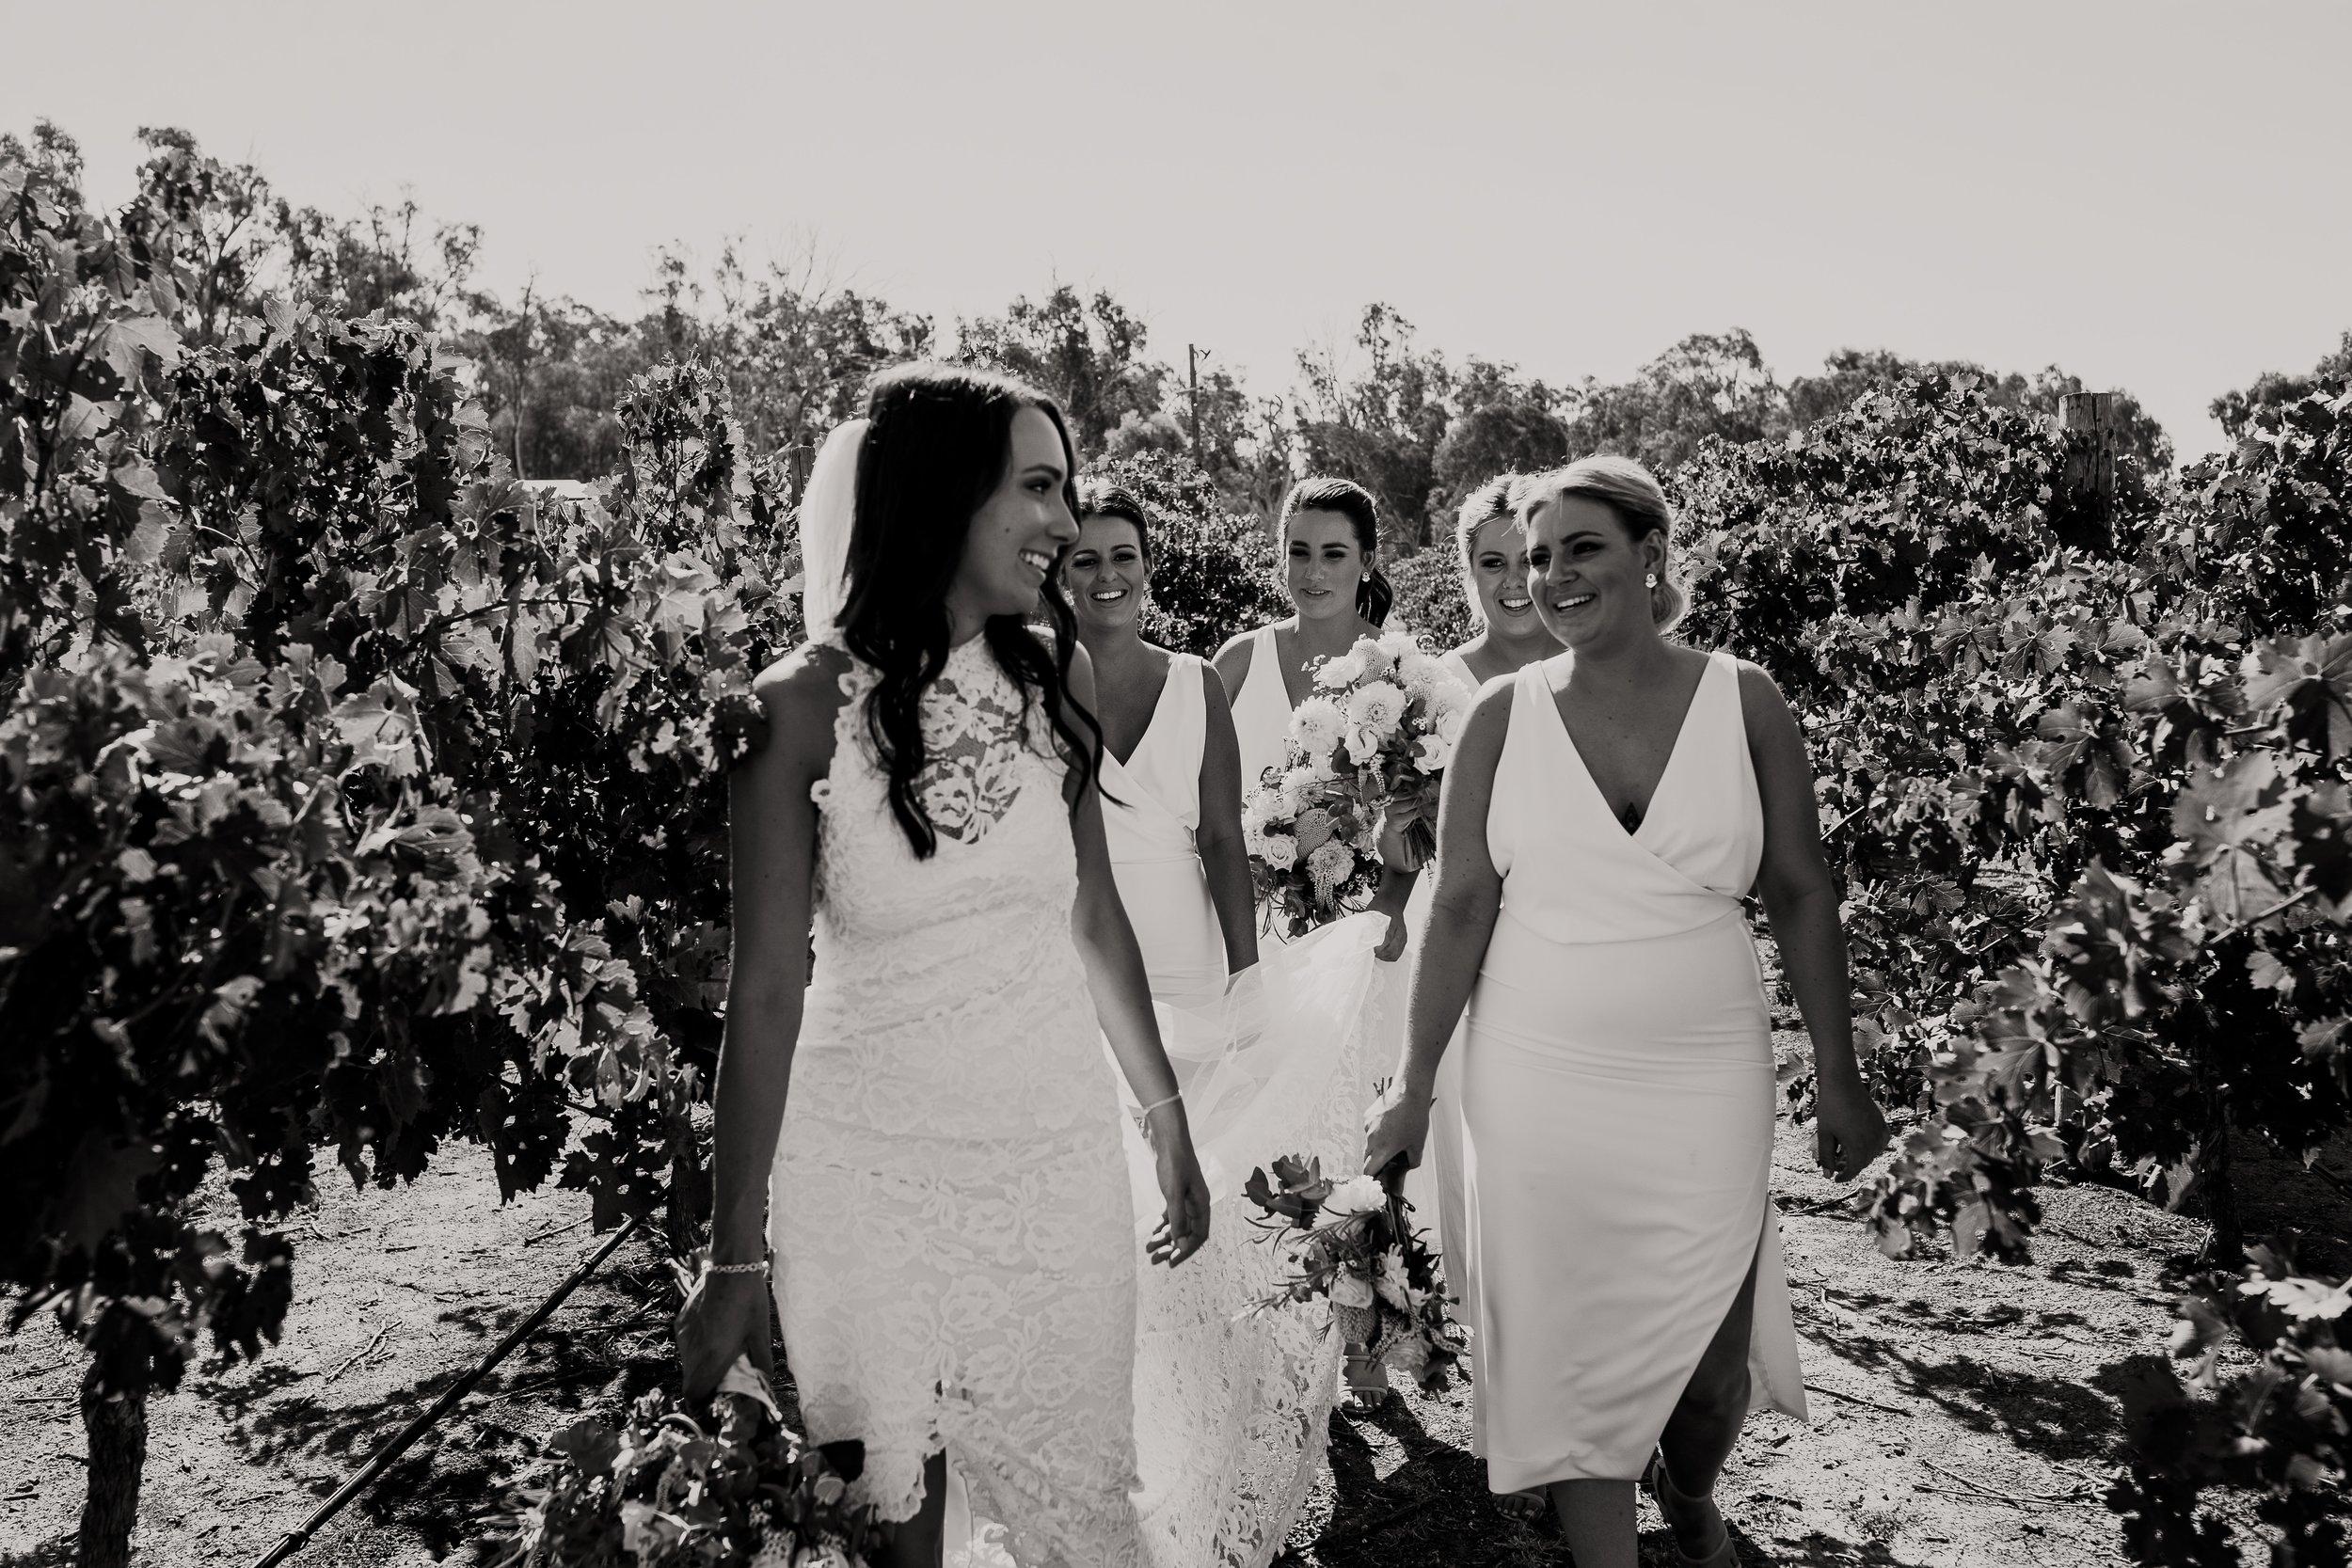 mickalathomas_puremacphotography_weddingphotographer_couplephotographer_Sheppartonphotographer_2898.jpg